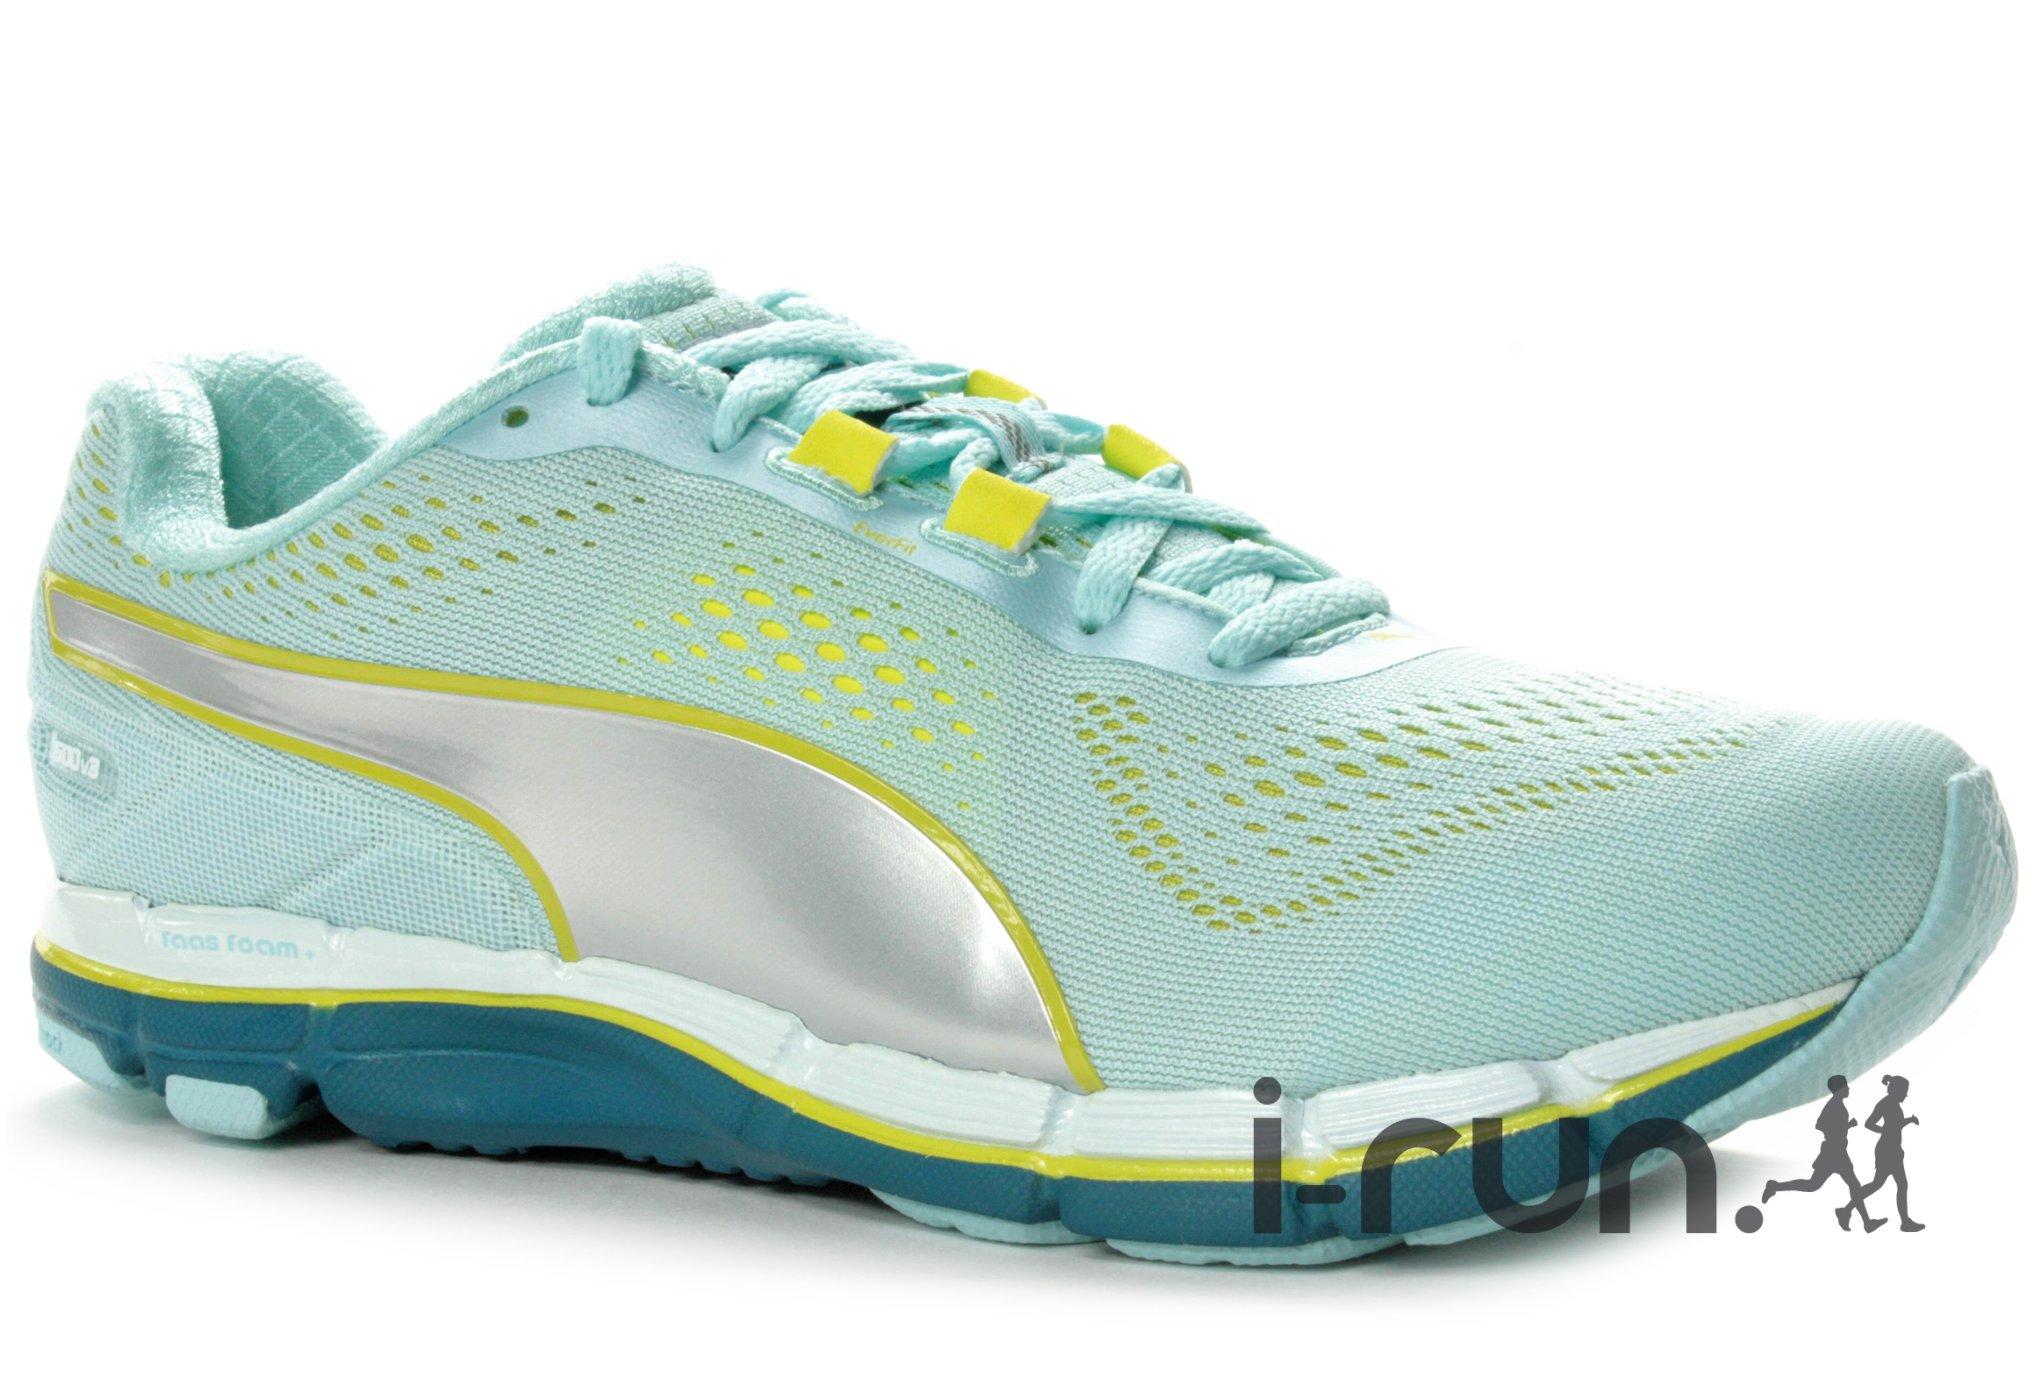 Puma Faas 600 V3 W Diététique Chaussures femme